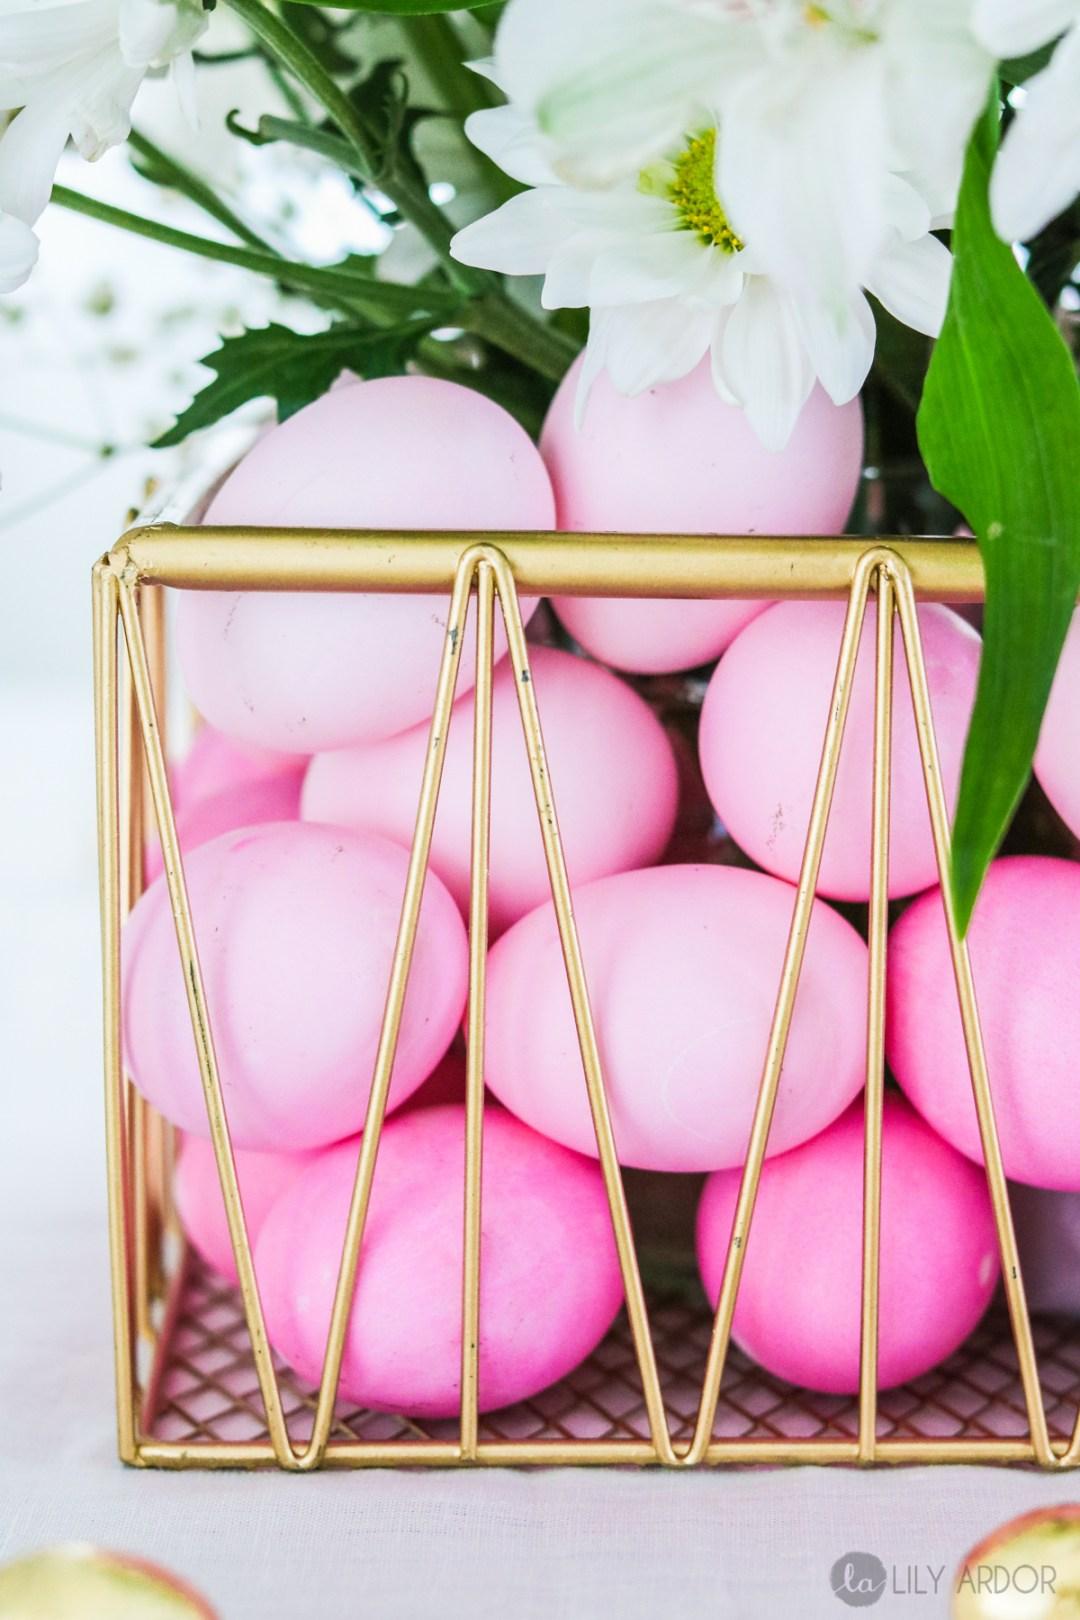 Ombre Easter Basket Centerpiece - Dying Eggs Ombre + CENTERPIECE